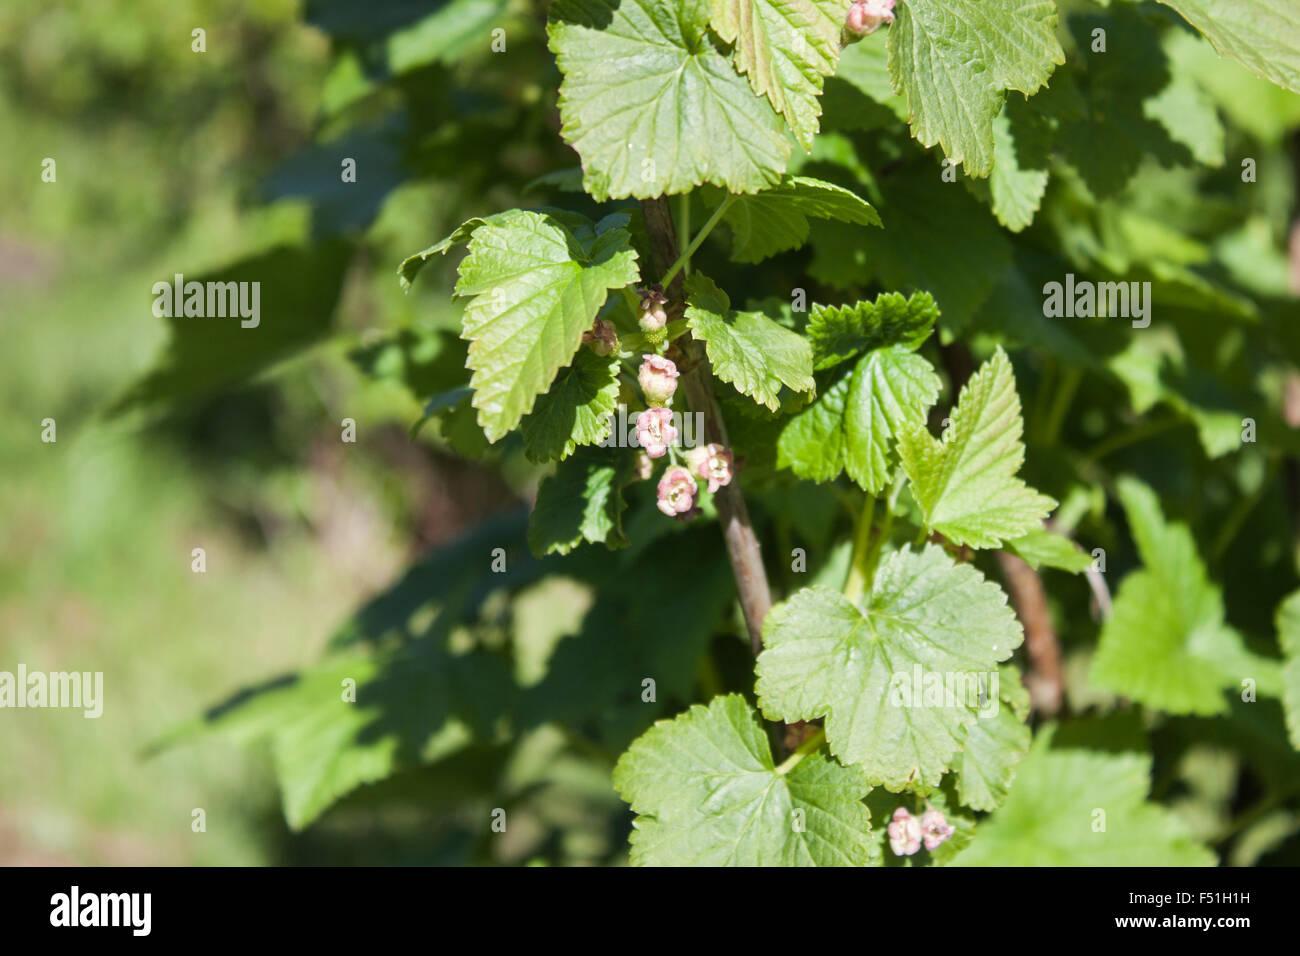 Black currant, ribes nigrum flowers, in the garden Stock Photo